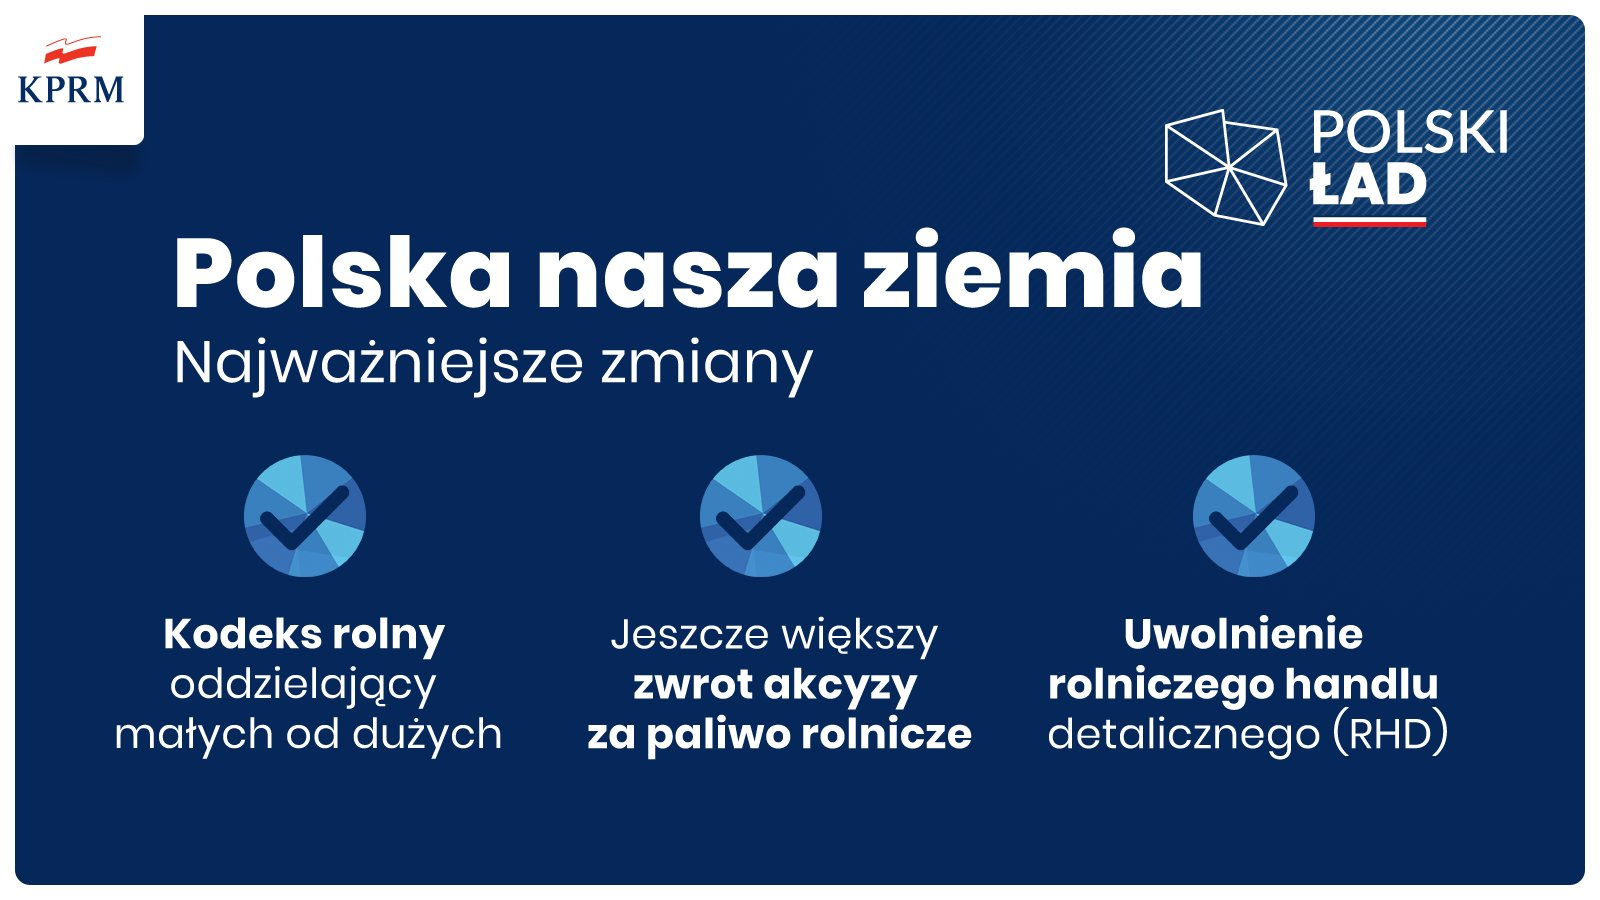 Polska nasza ziemia